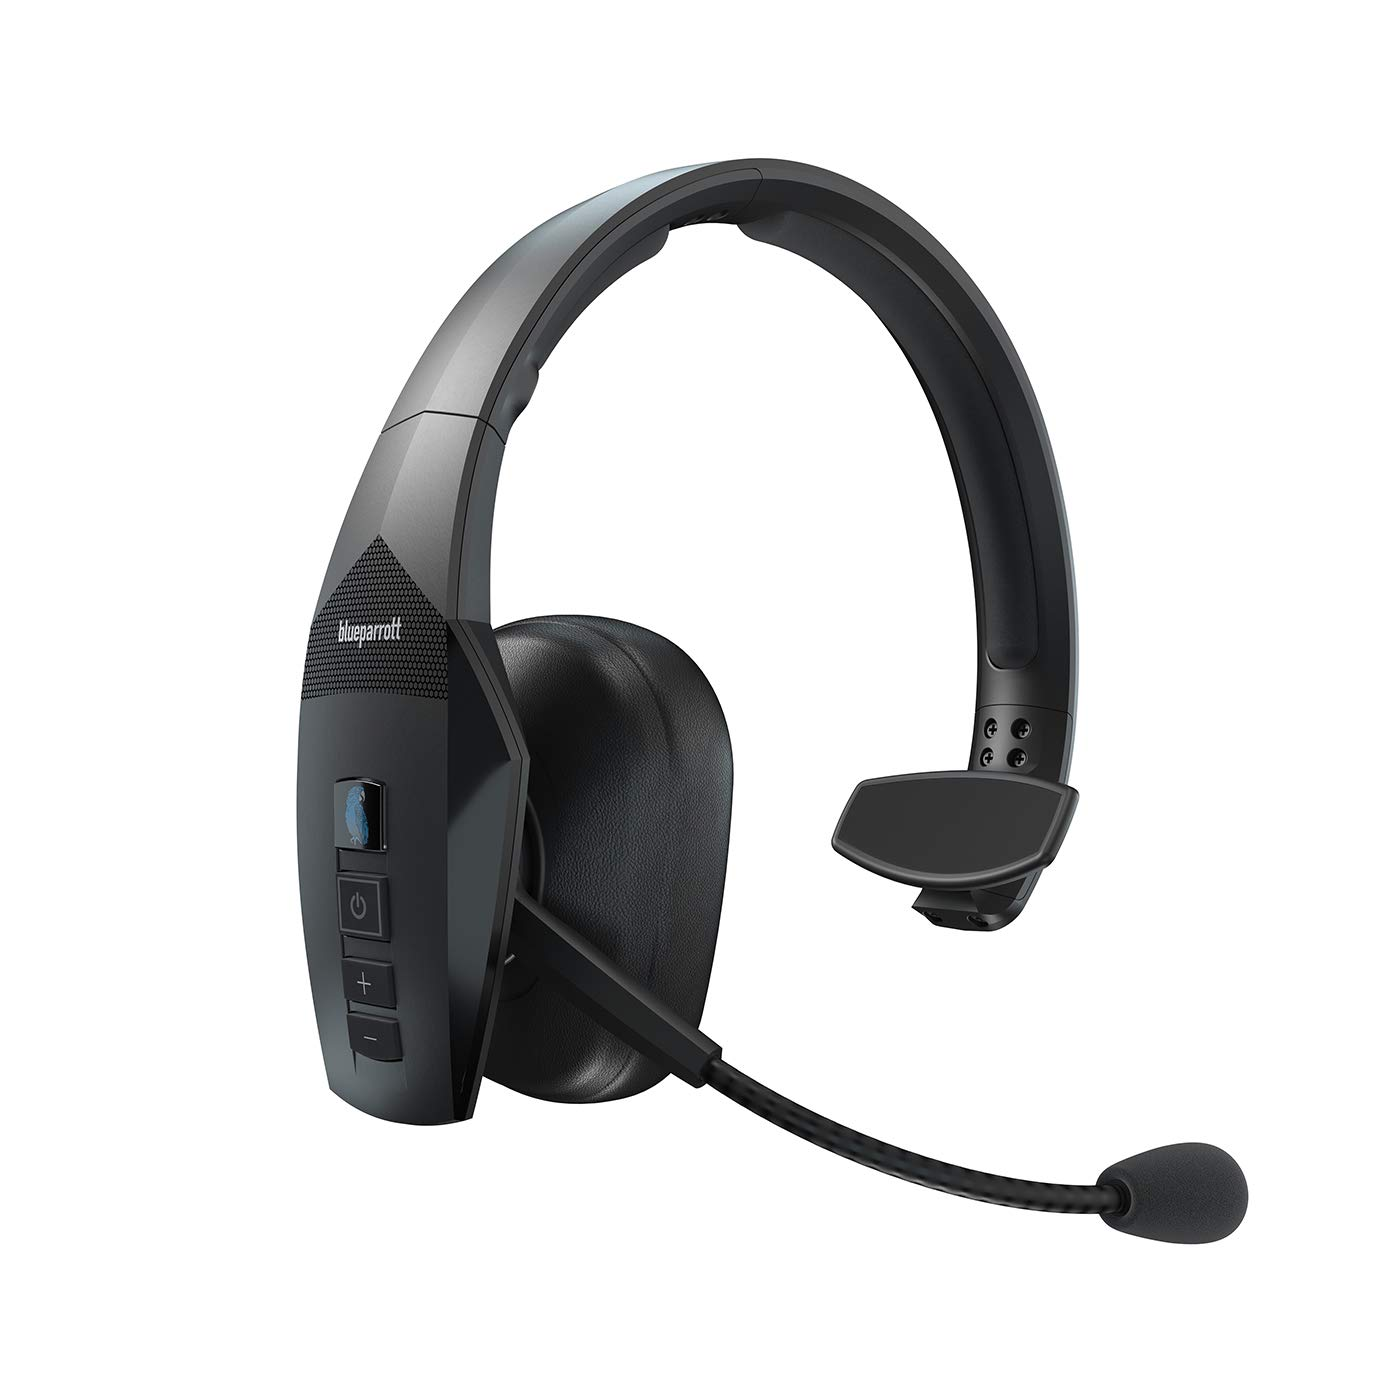 BlueParrott B550-XT Ultra-Rugged, Voice-Controlled, 96% Noise-Canceling Bluetooth Headset